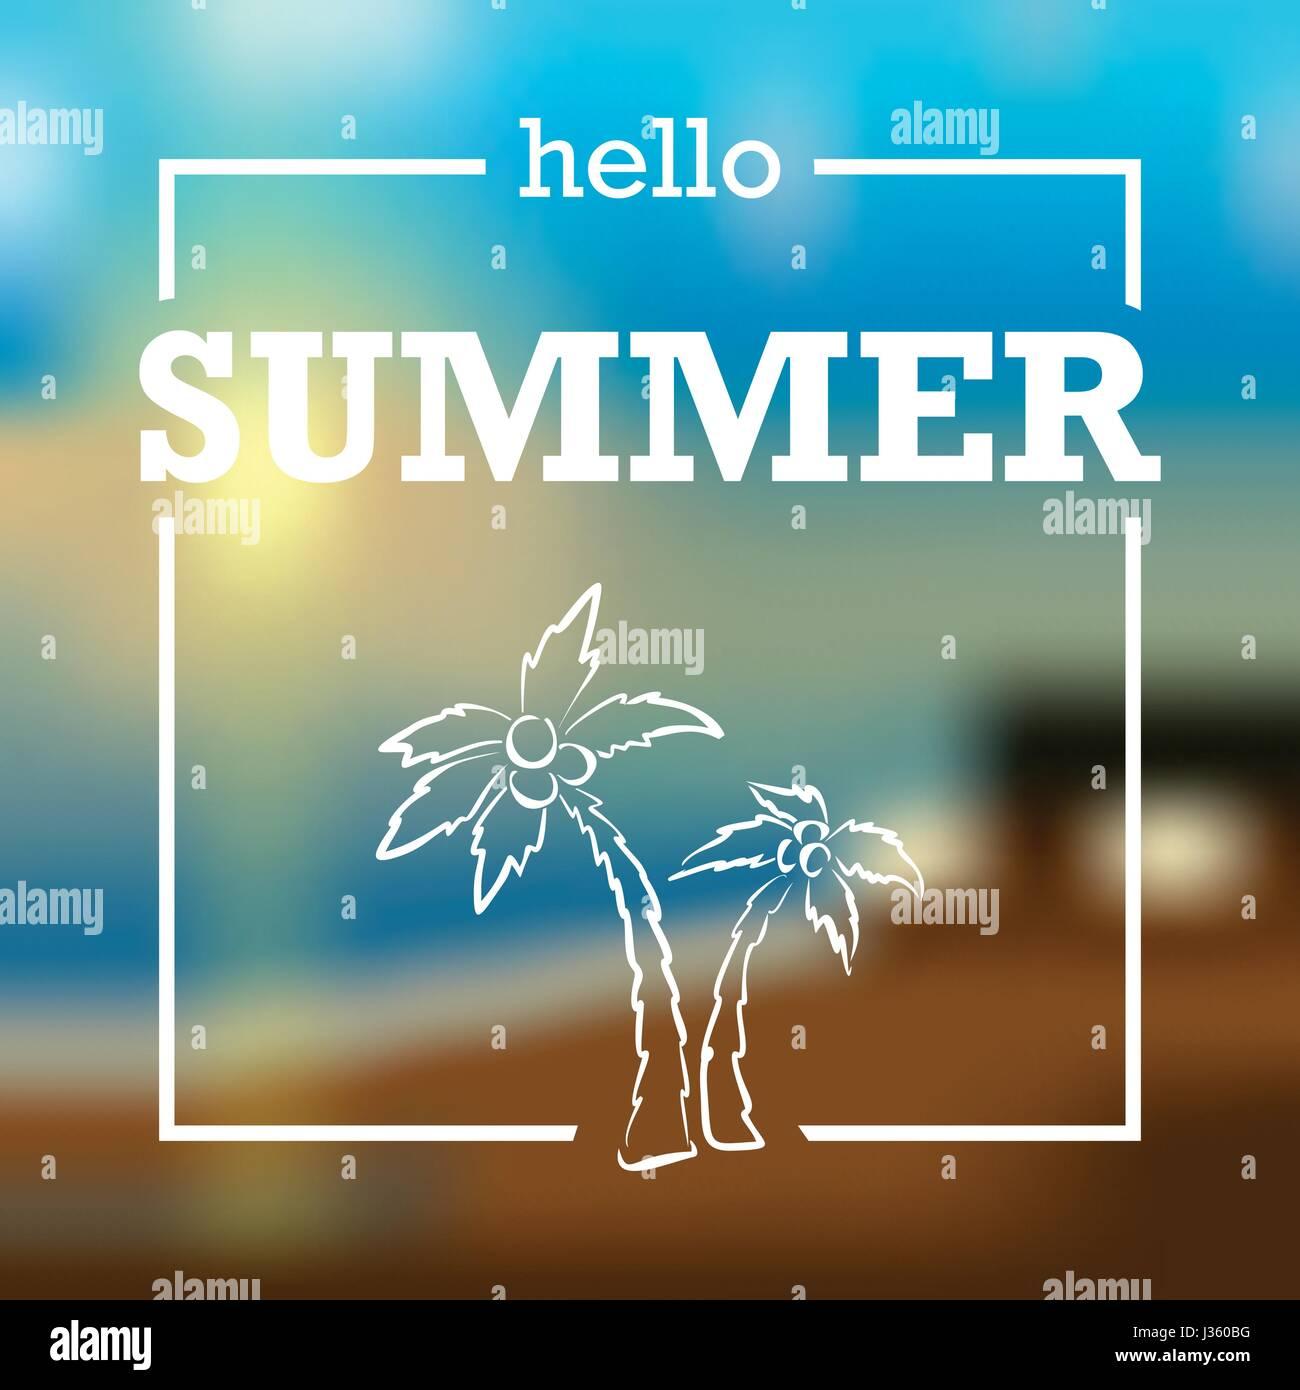 Summer Card On Blurred Background Vector Illustration. Hello Summer.